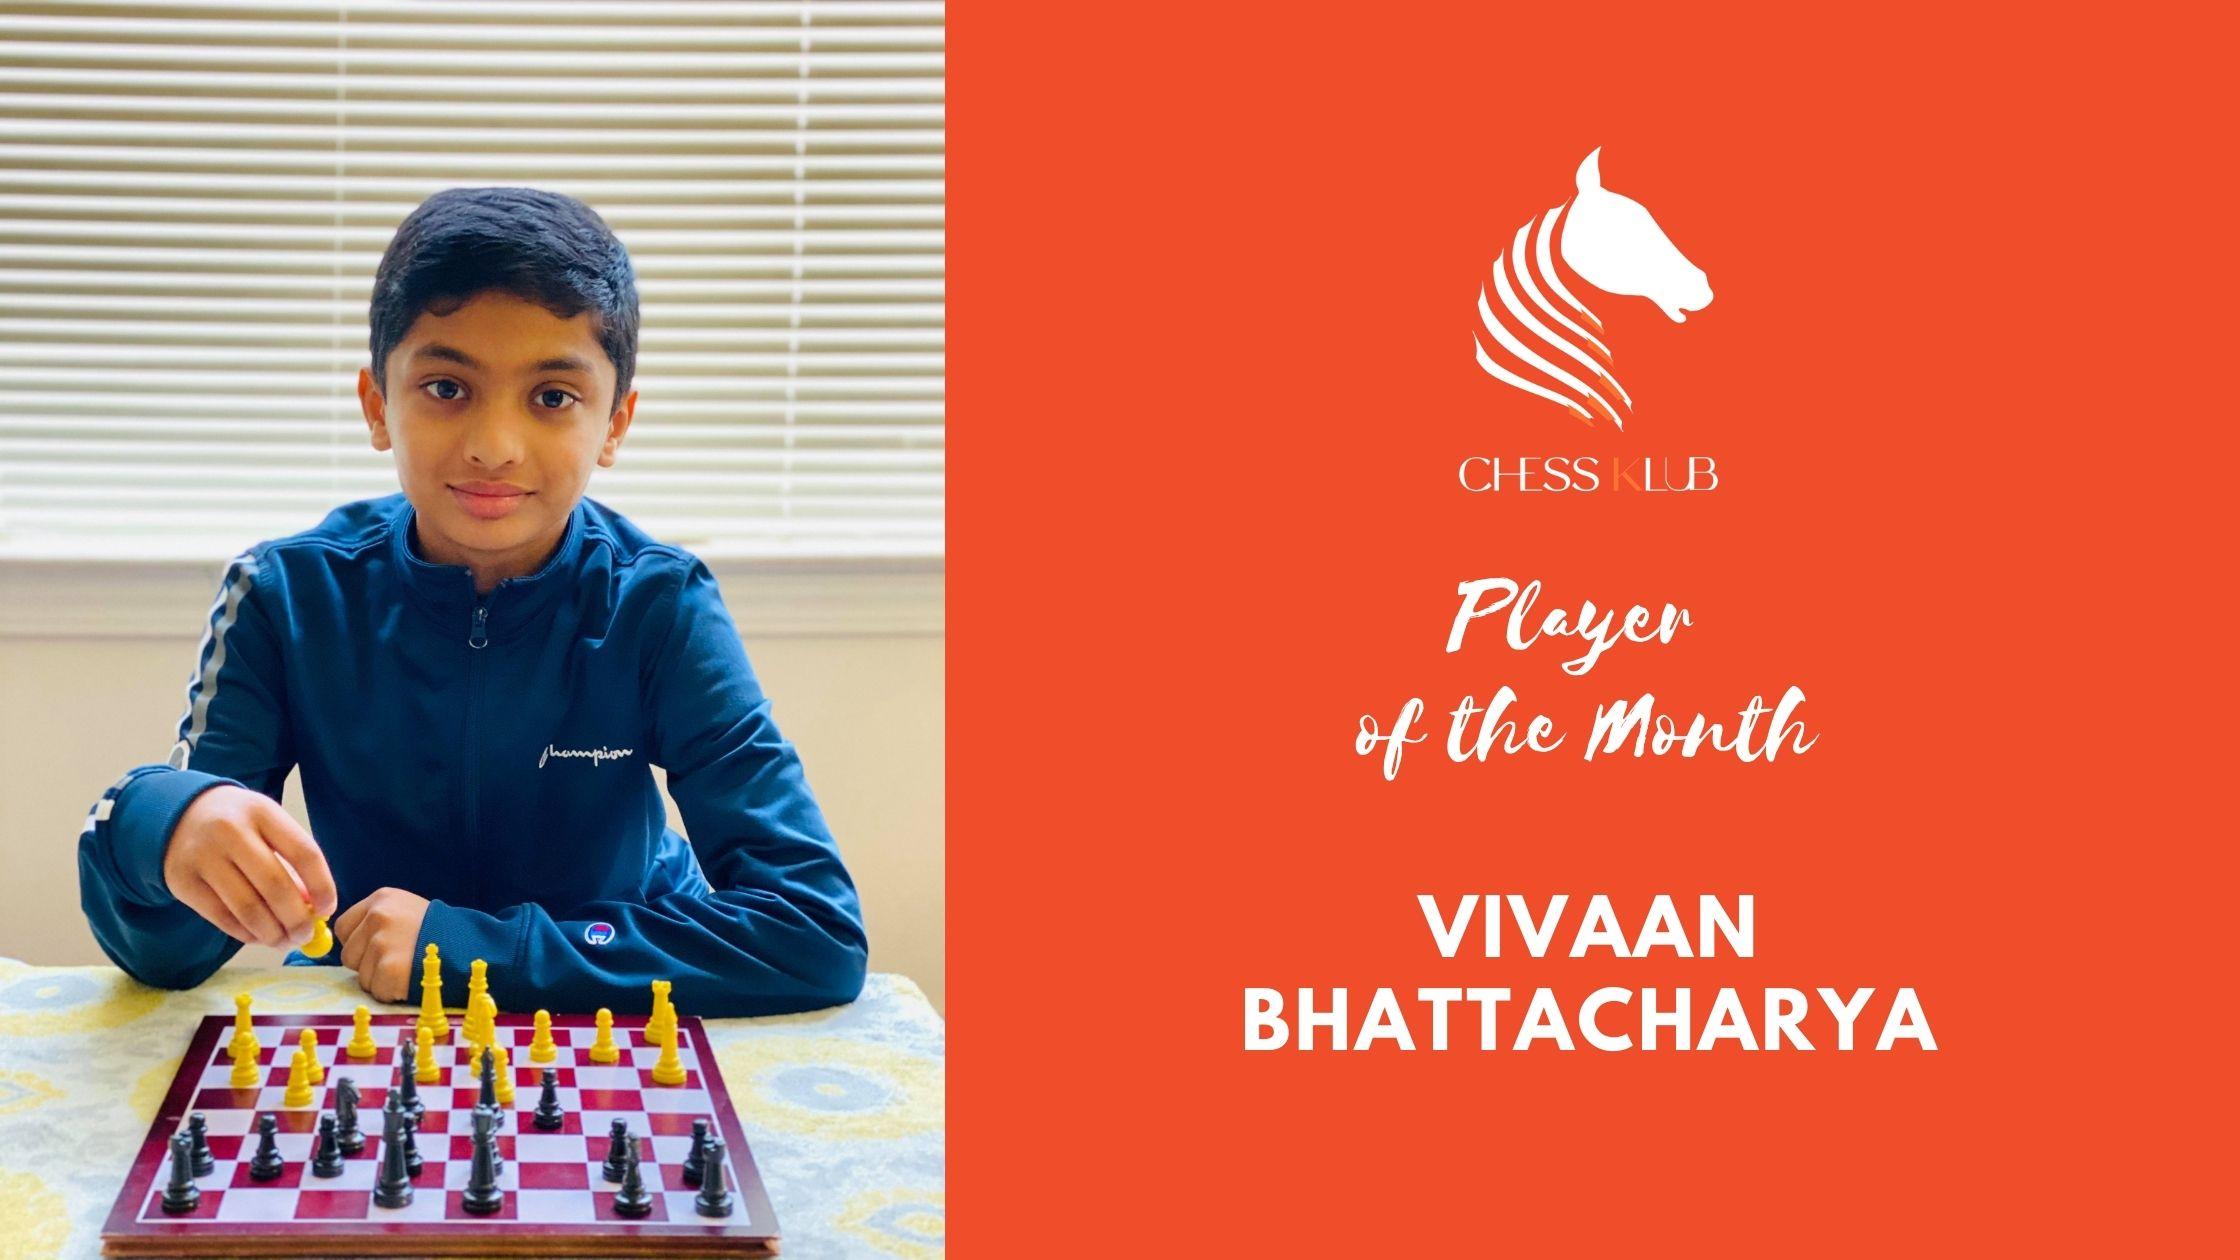 Vivaan Bhattacharya - Champion of the Month